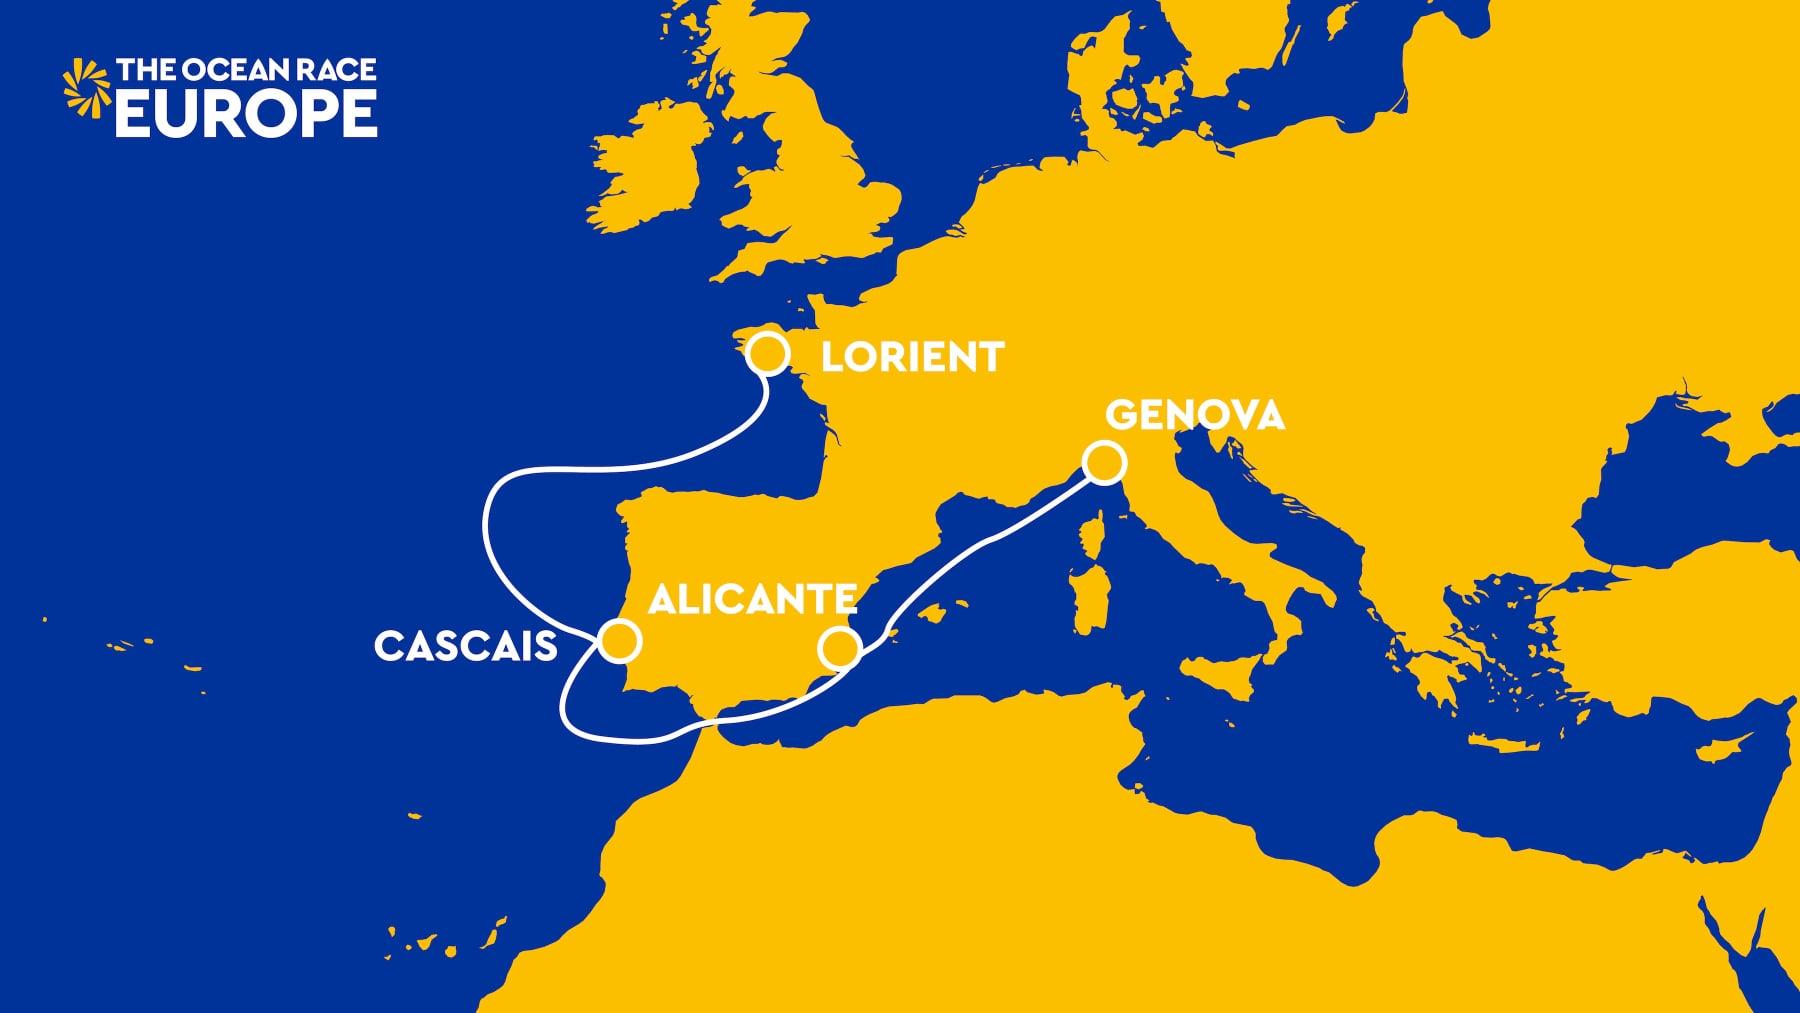 Ocean Race route